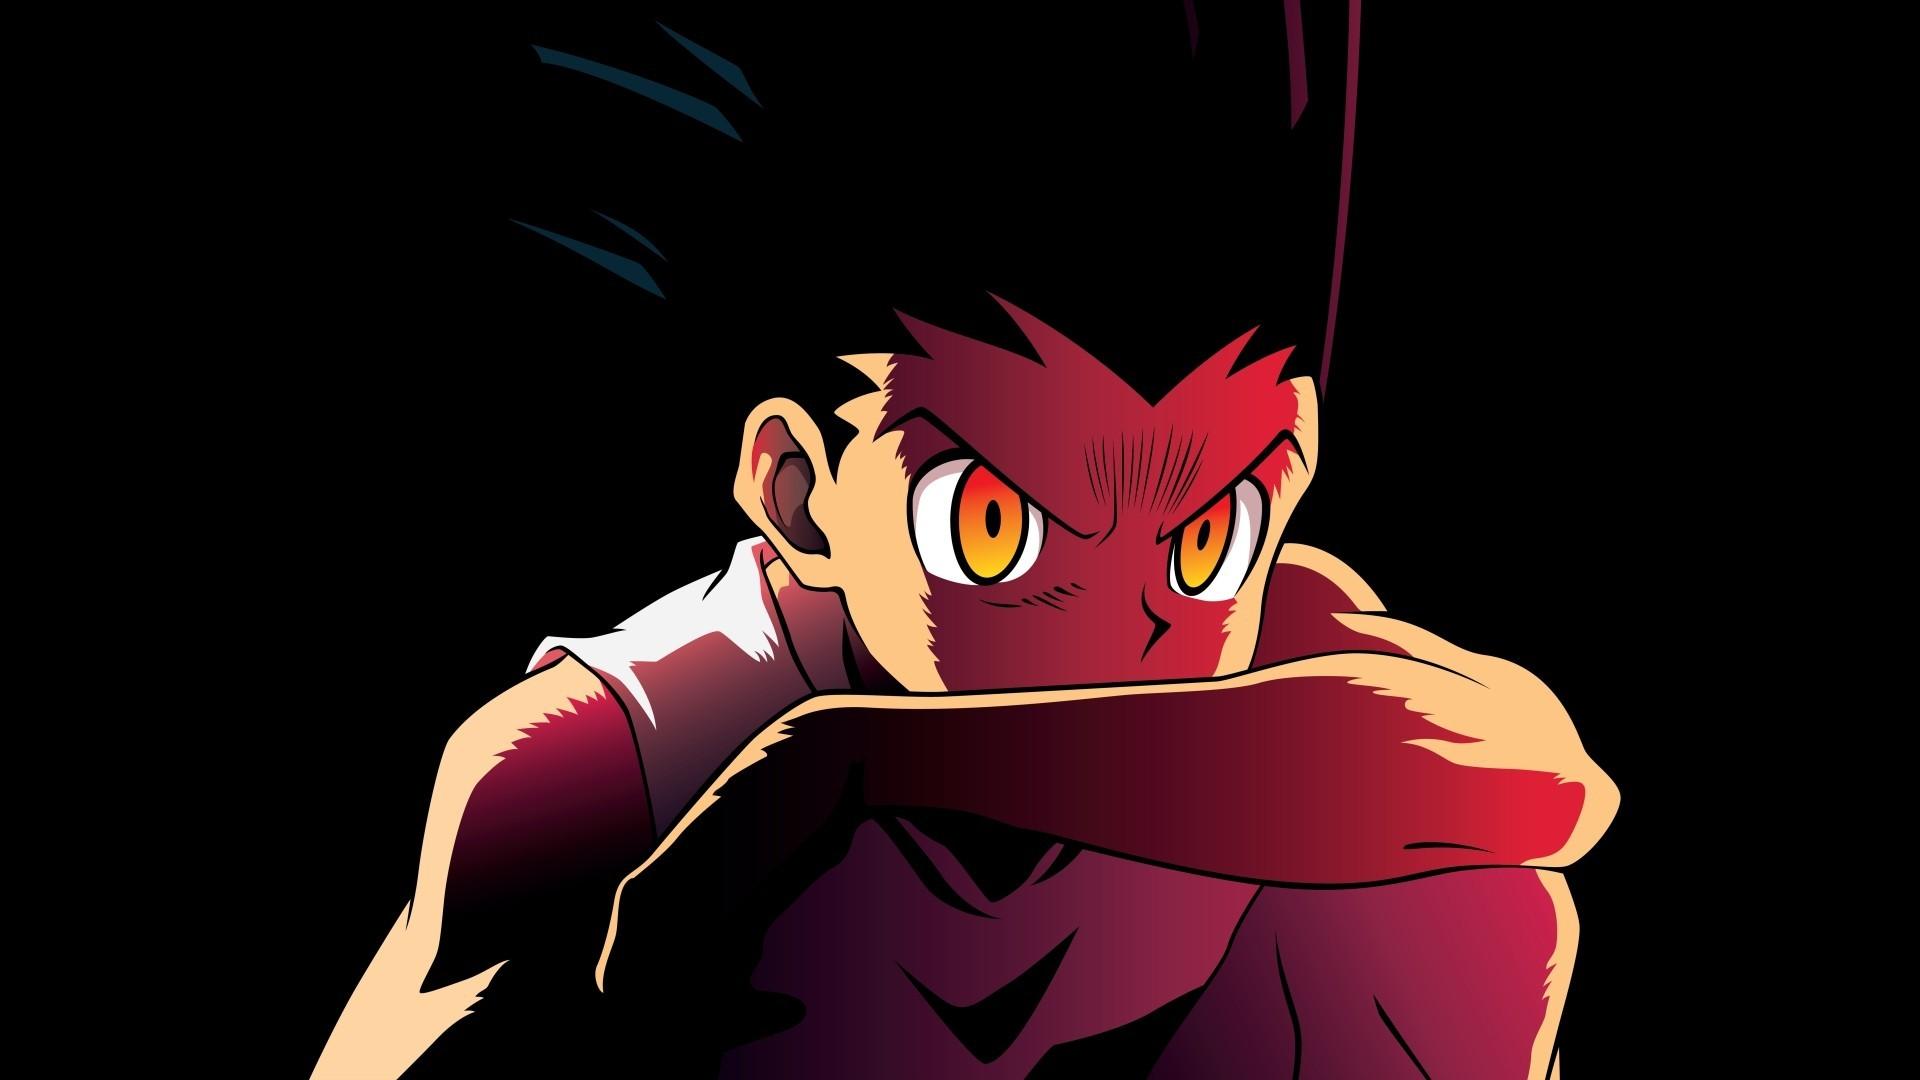 Free Wallpaper Anime Wallpaper Hd Hunter X Hunter